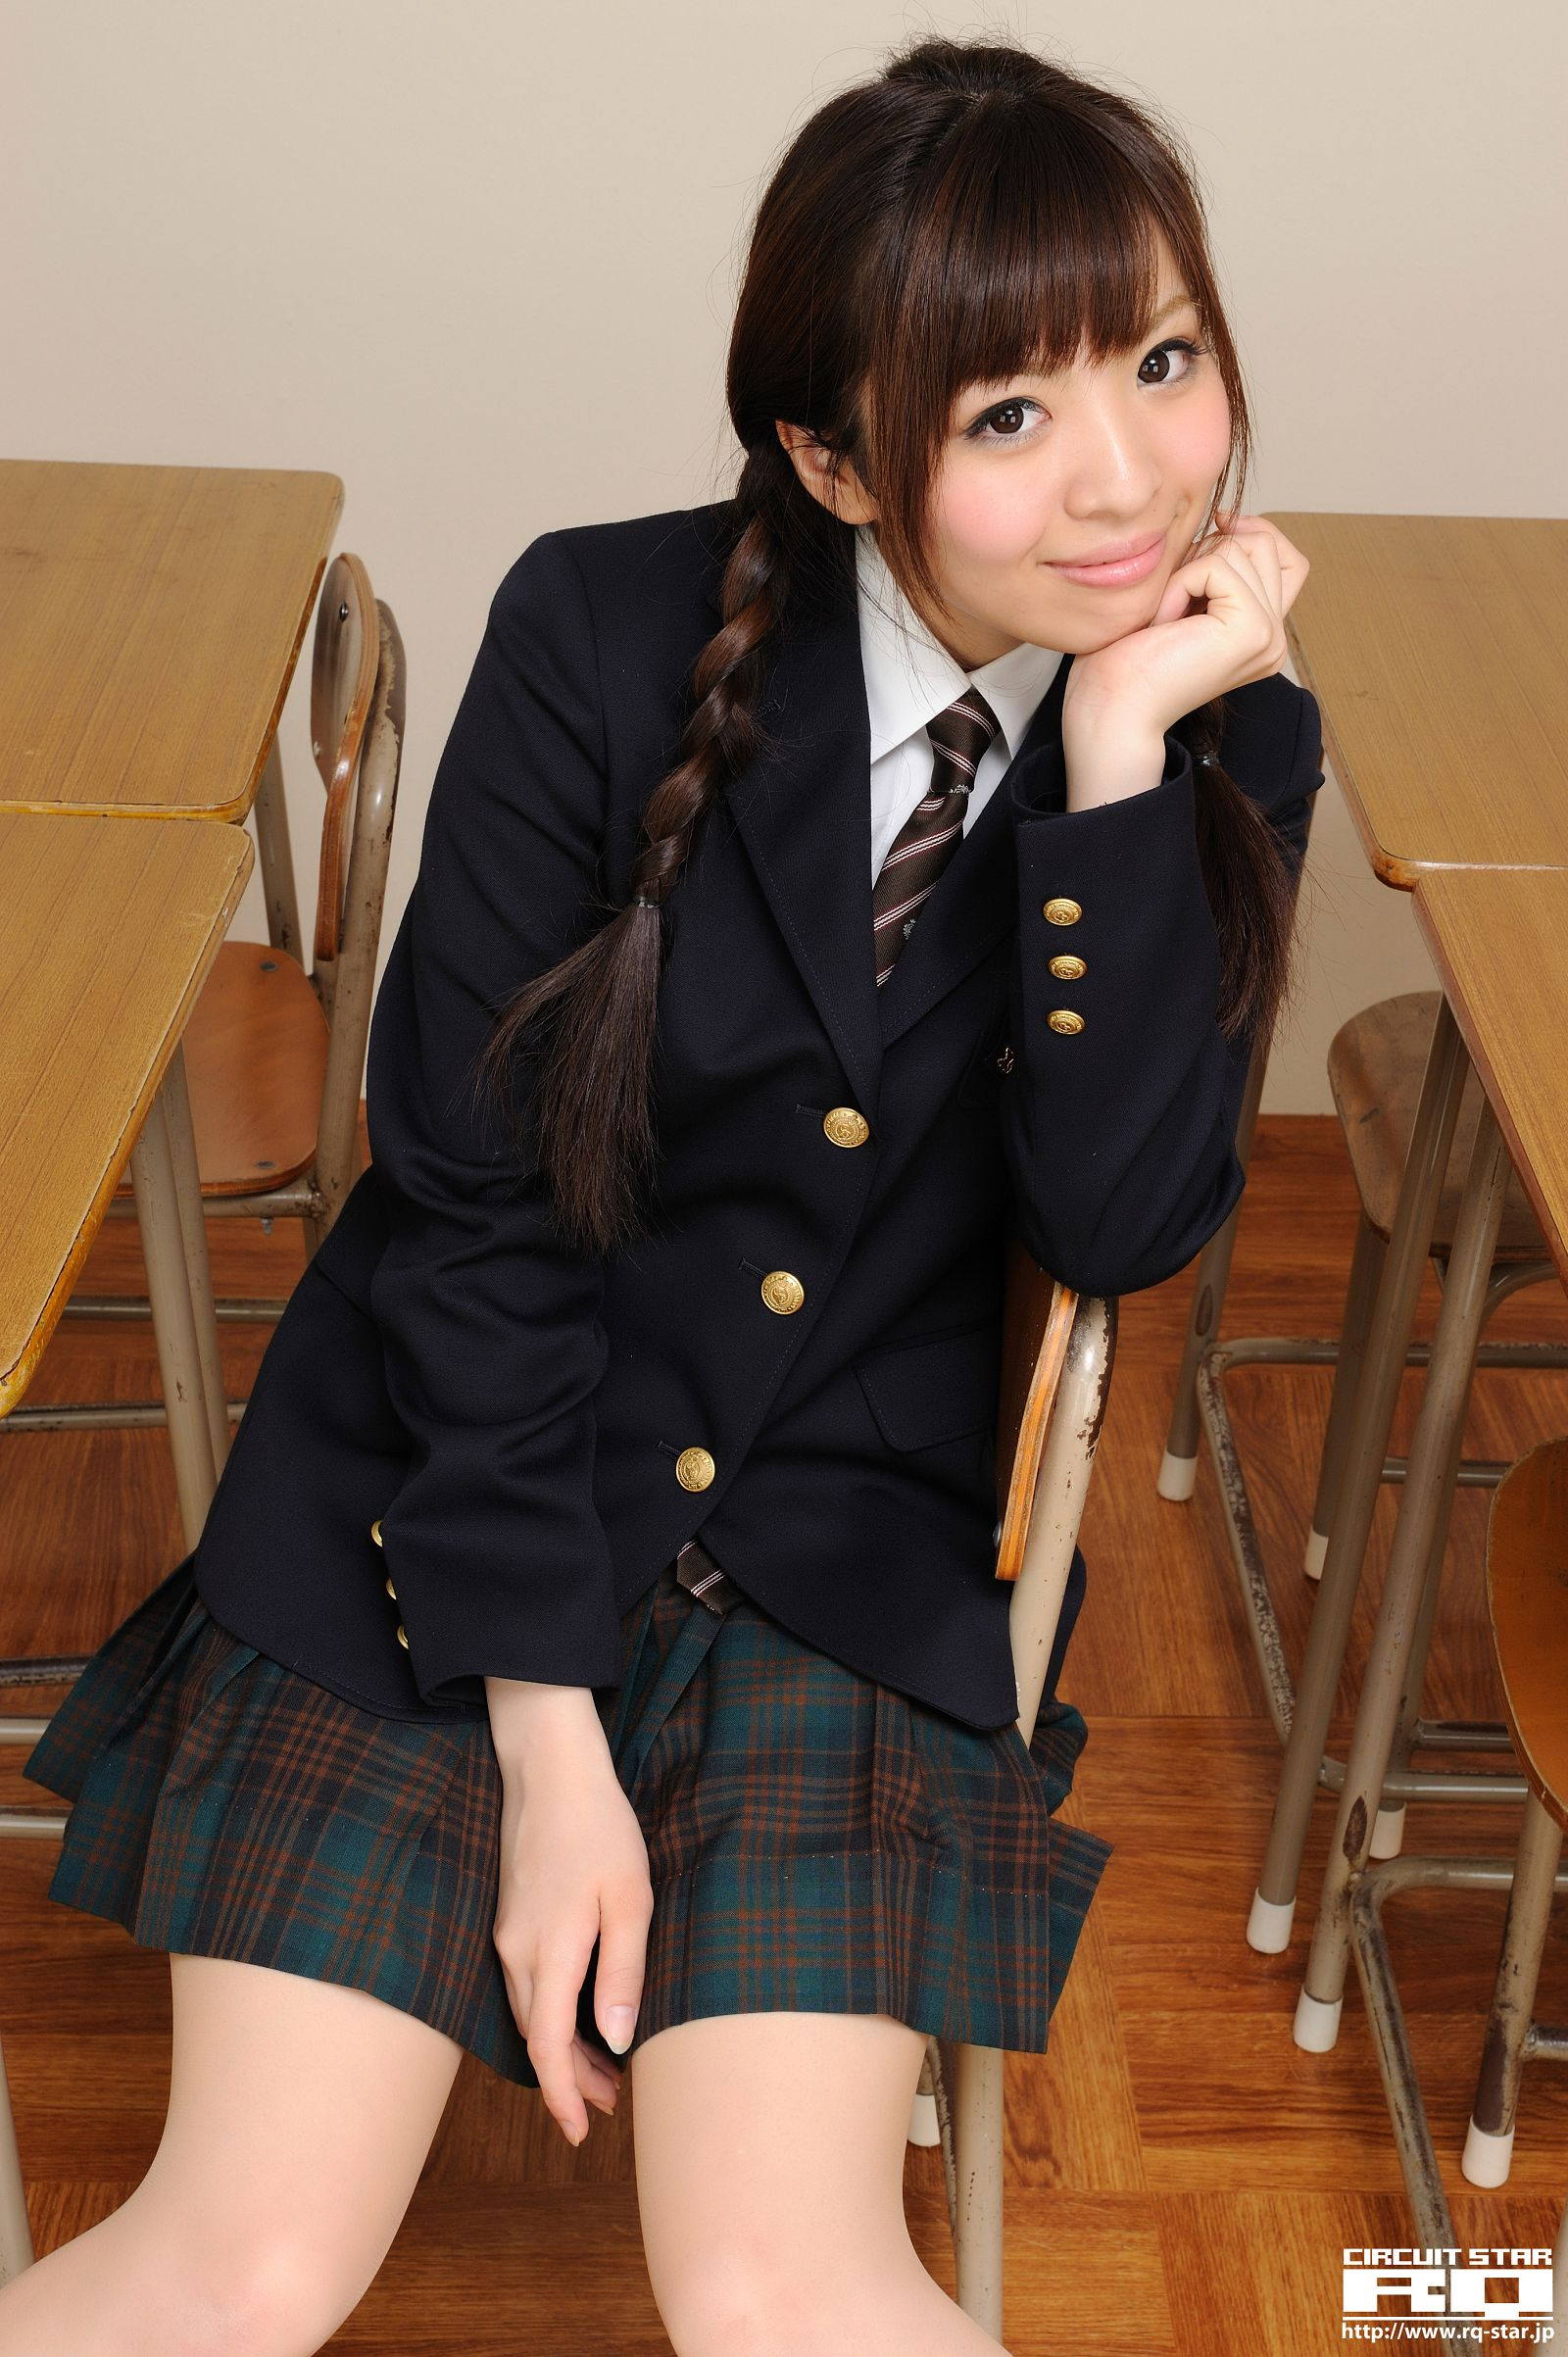 [RQ STAR美女] NO.00515 Mayuka Kuroda 锿蚪Y花 Student Style[111P] RQ STAR 第2张